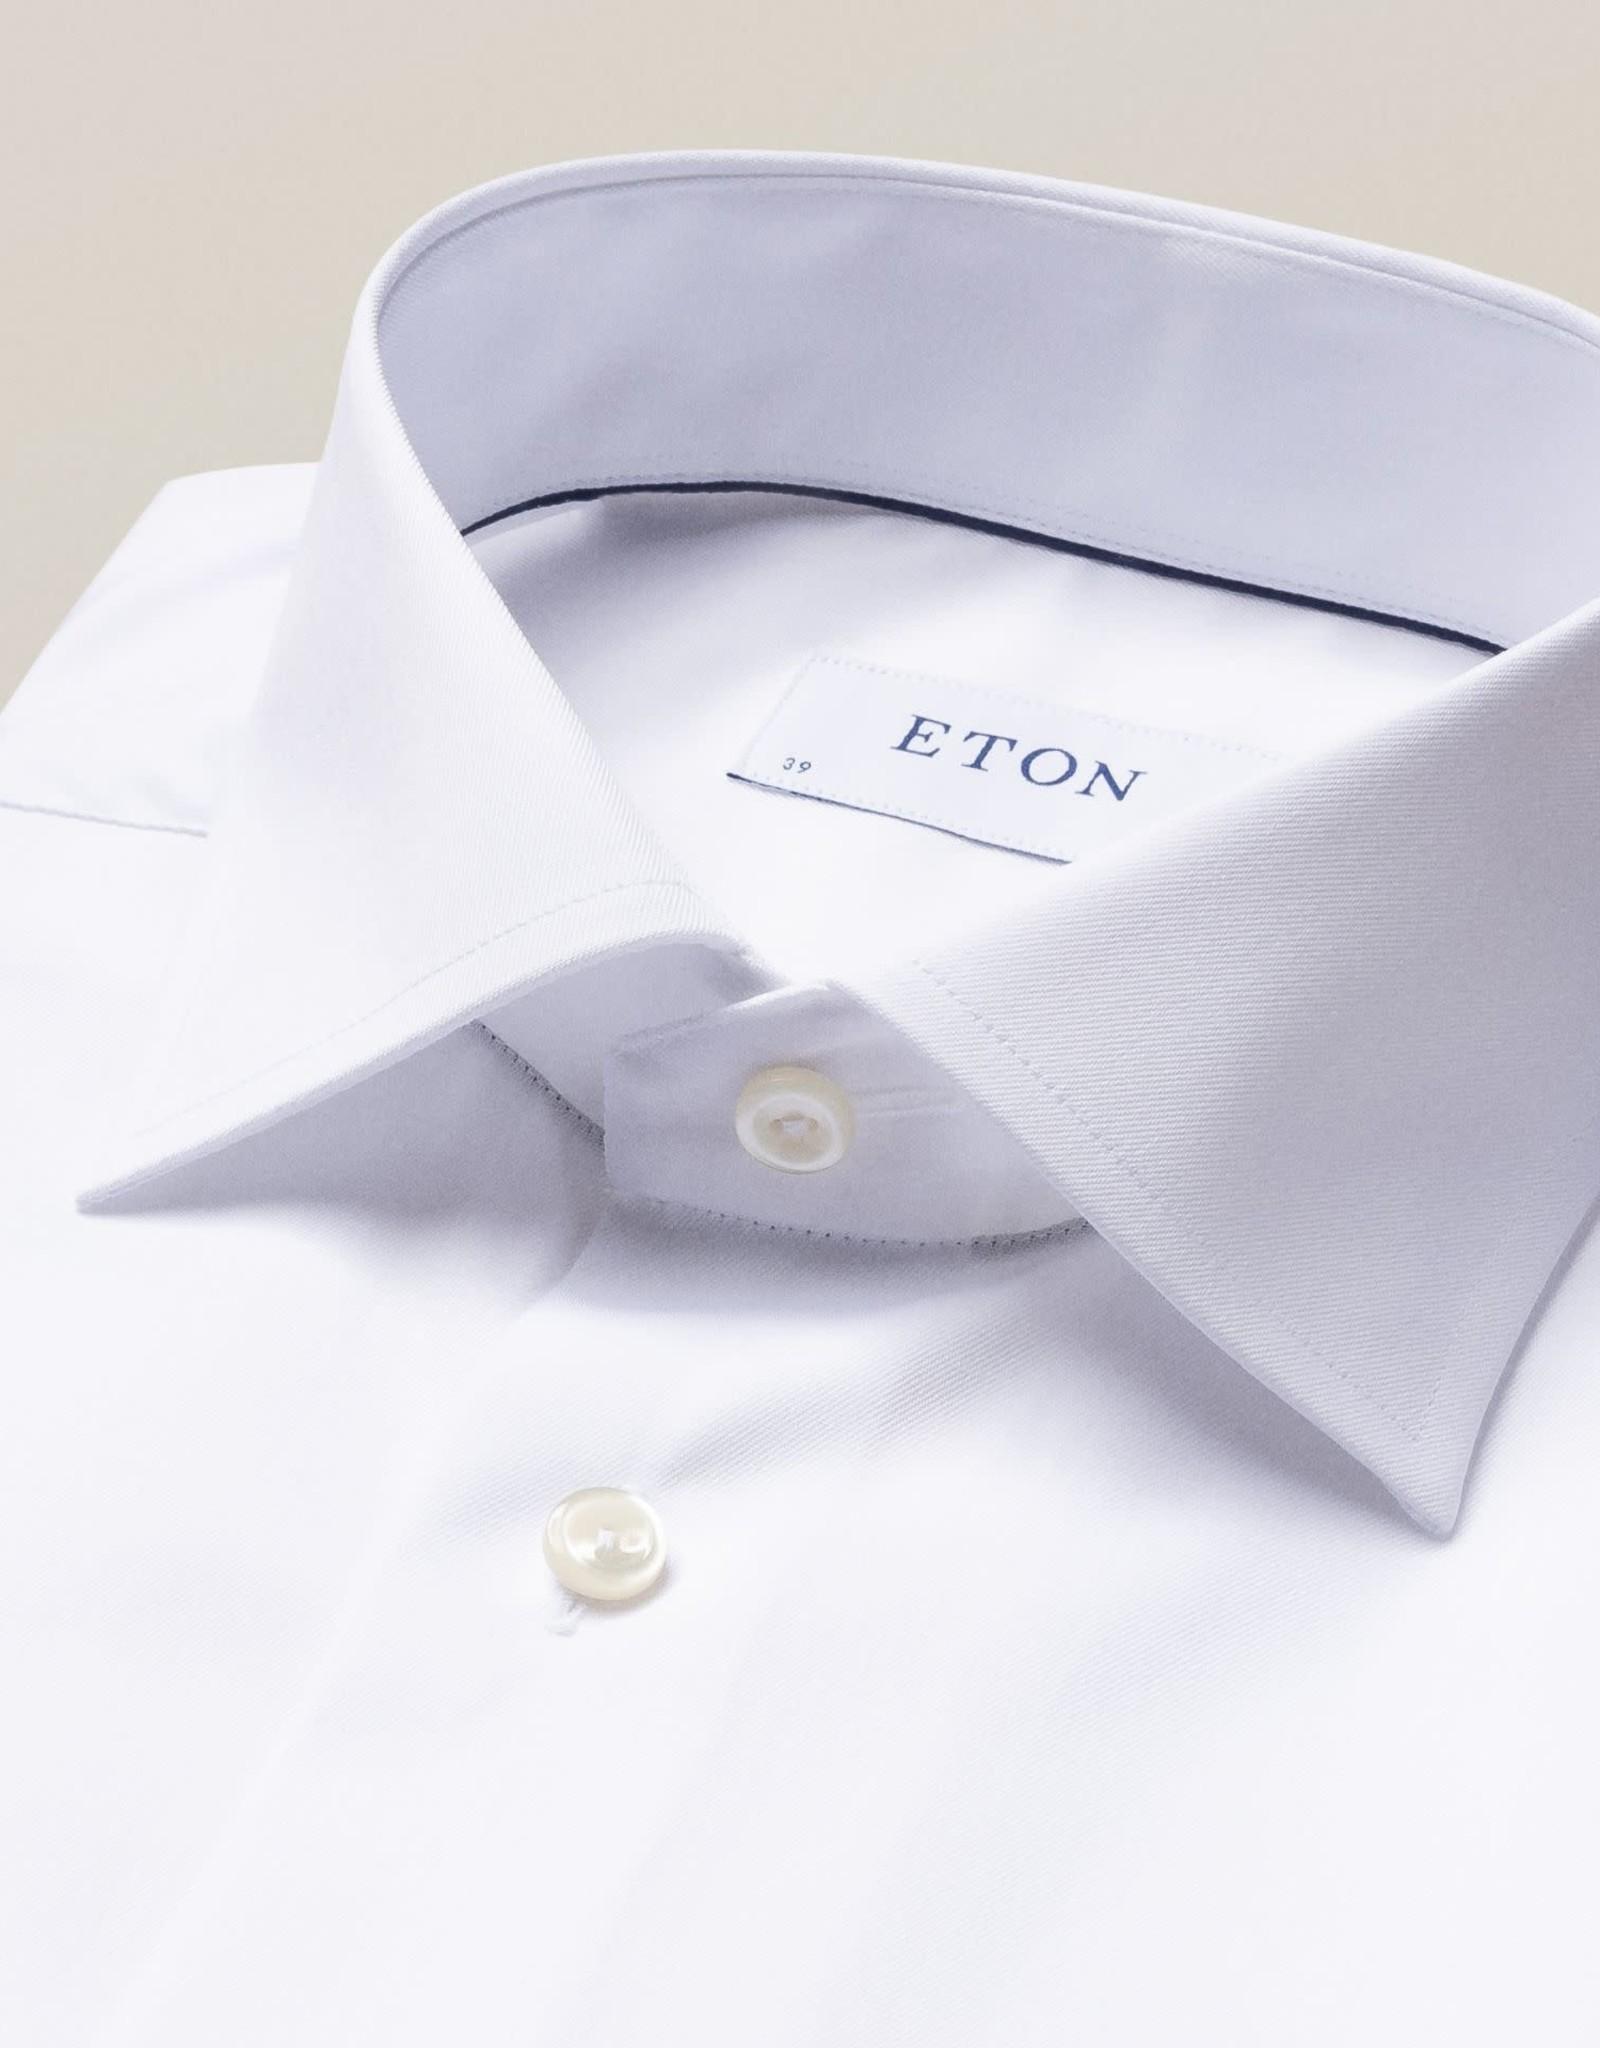 Eton Eton Contemporary Fit White French Cuff Dress Shirt